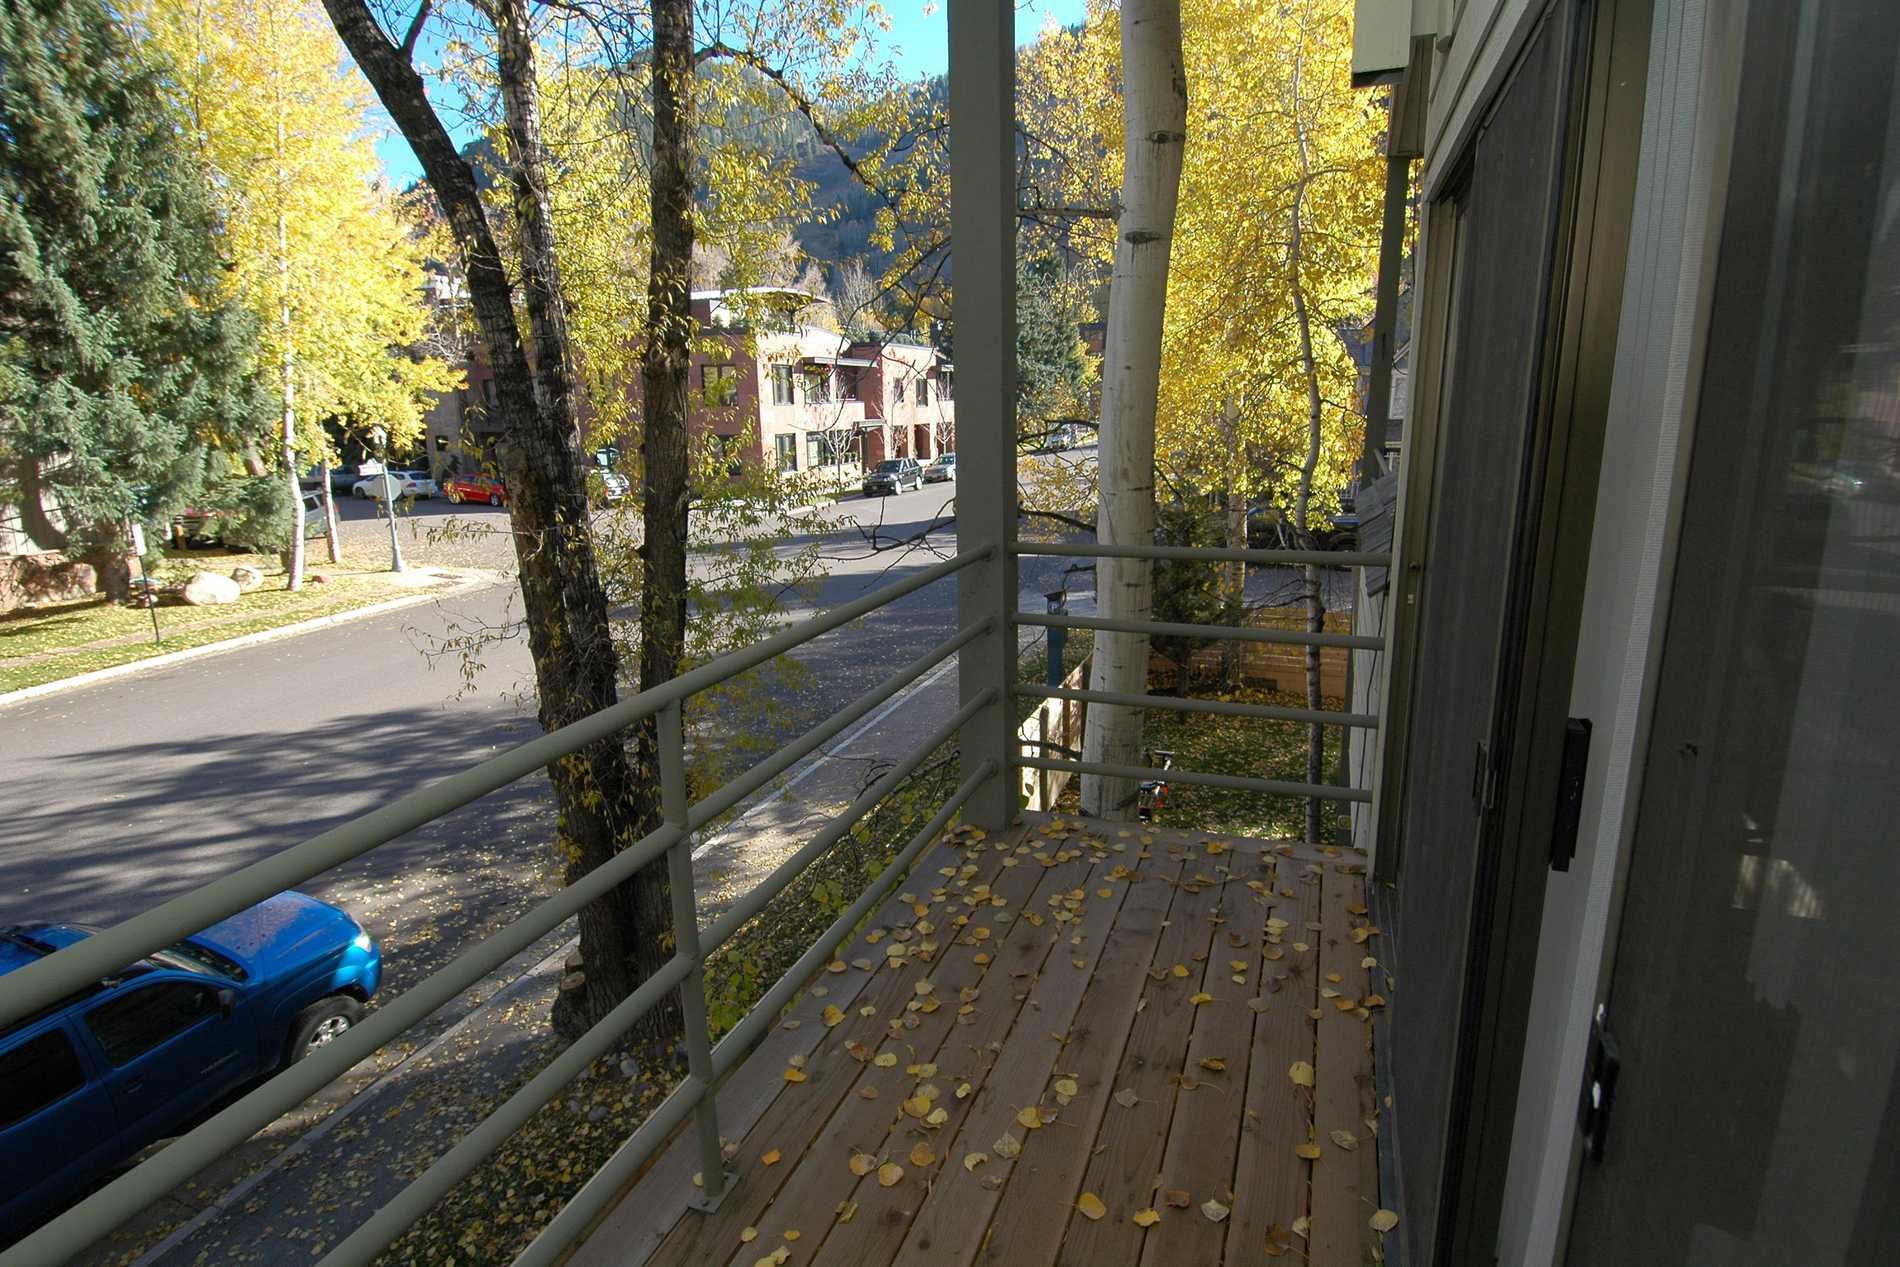 311 S. Aspen Street Unit 6 Aspen Photo 1